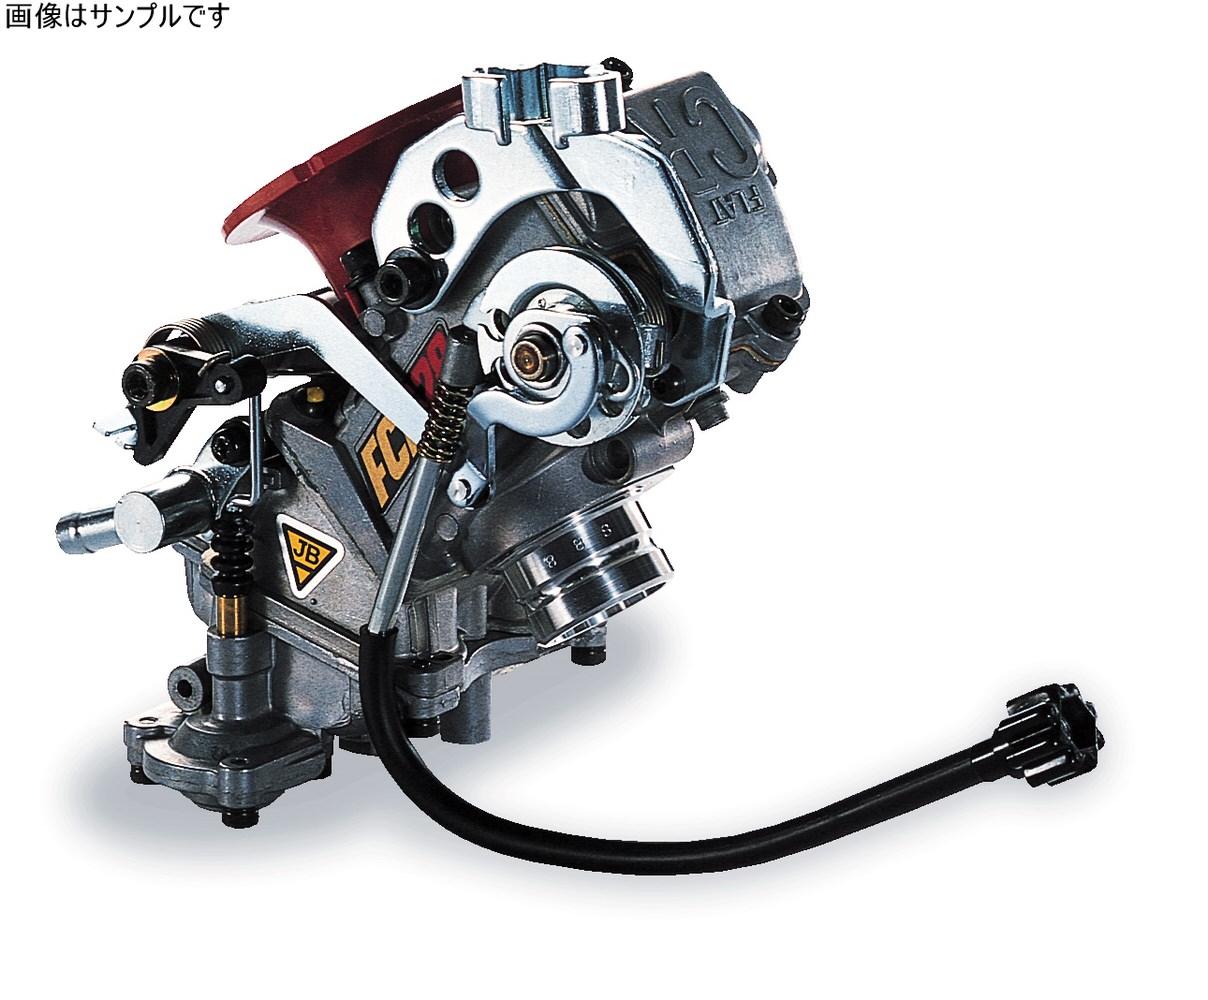 KEIHIN FCRΦ28 キャブレターキット(ダウンドラフト) ファンネル仕様 JB POWER(BITO R&D) KSR110(03~08年)